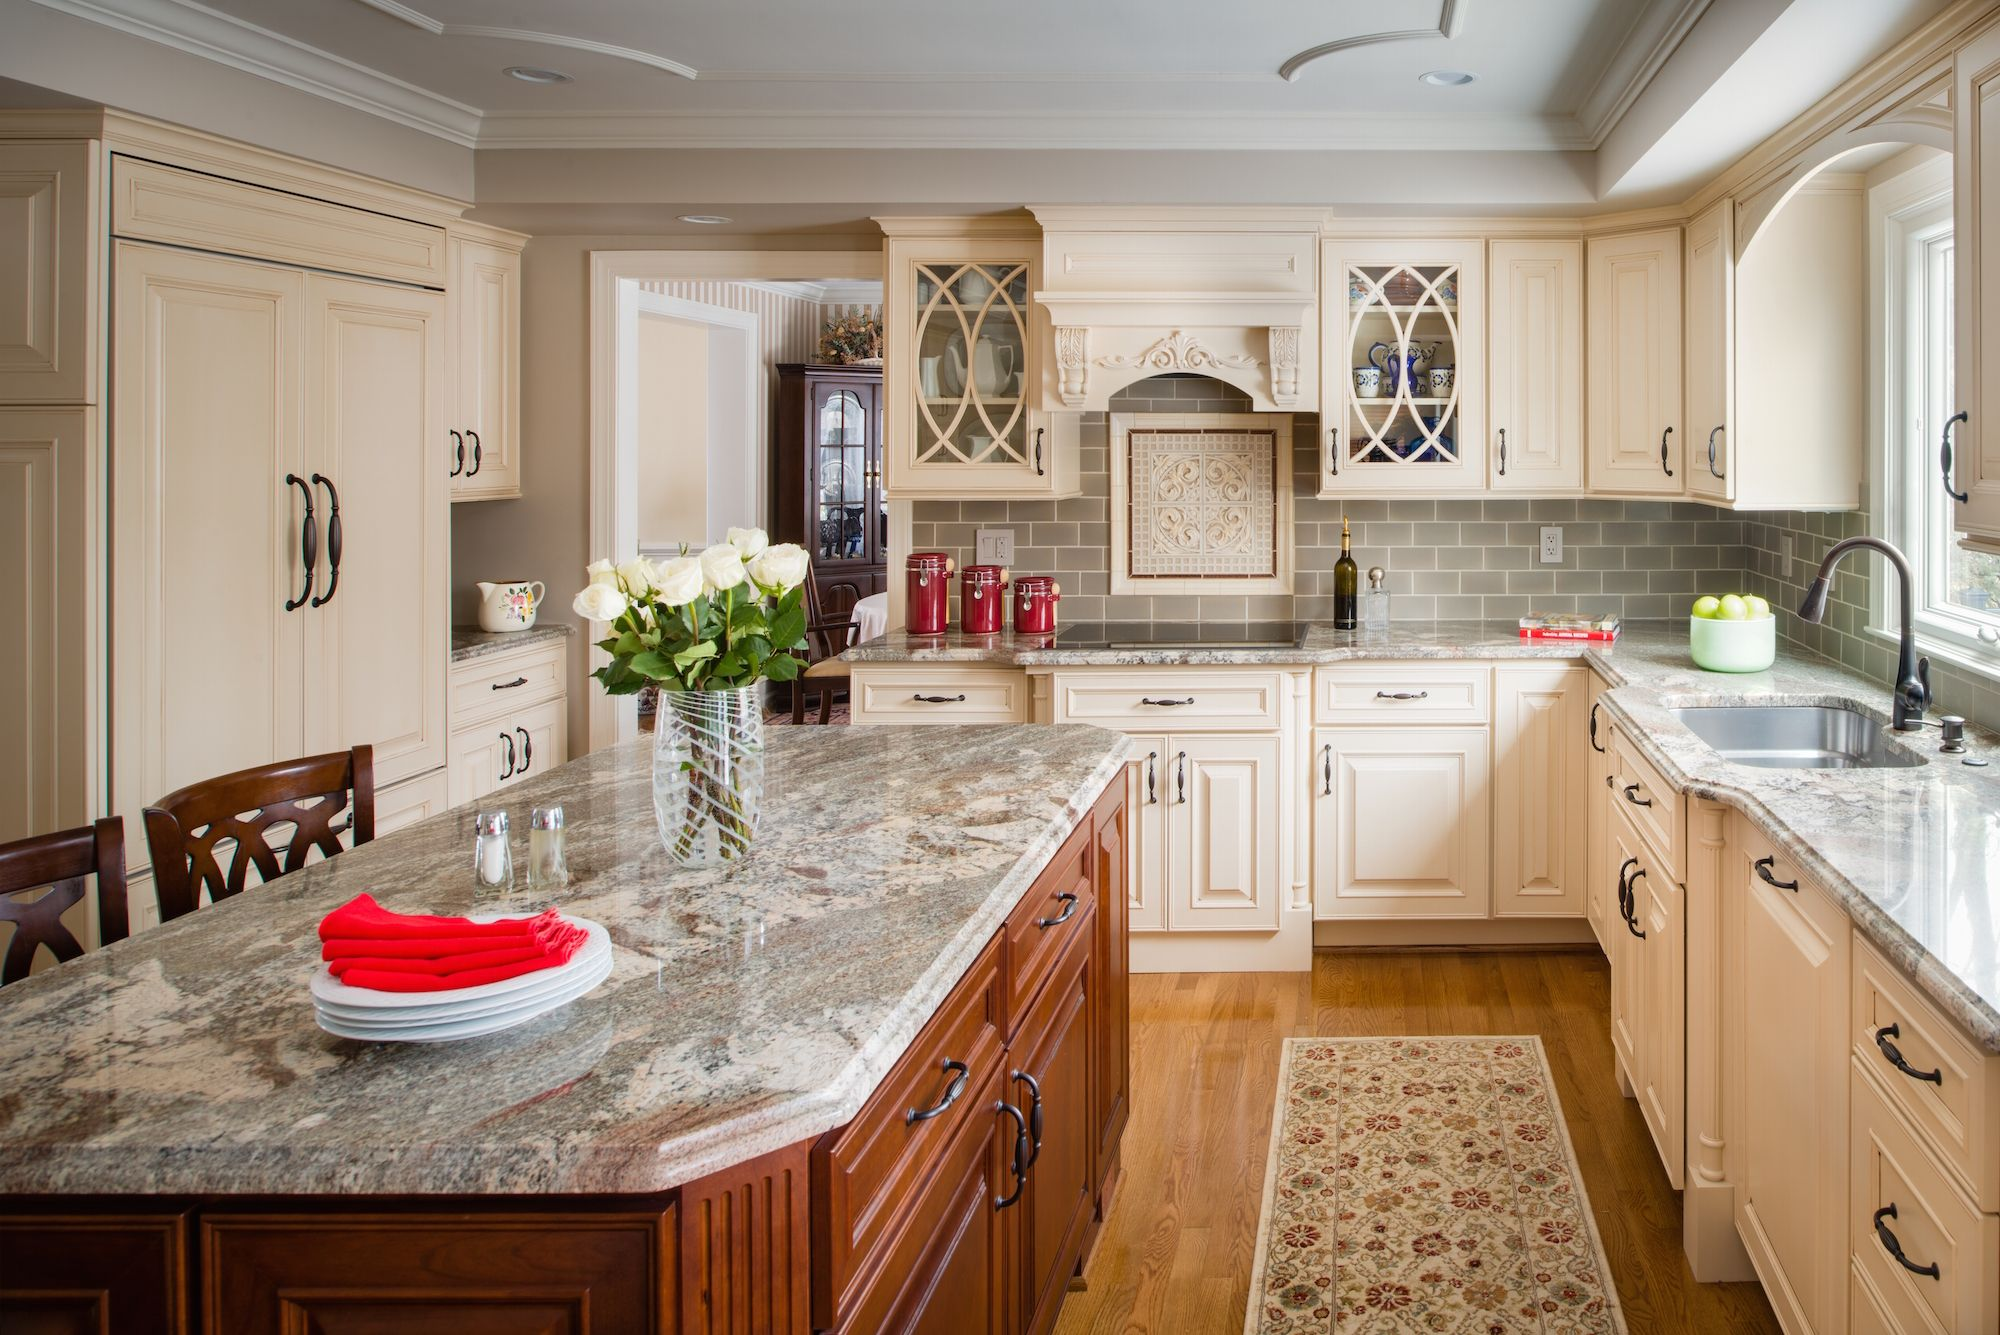 Kitchen cabinets room designs pinterest kitchens for Caspian kitchen cabinets